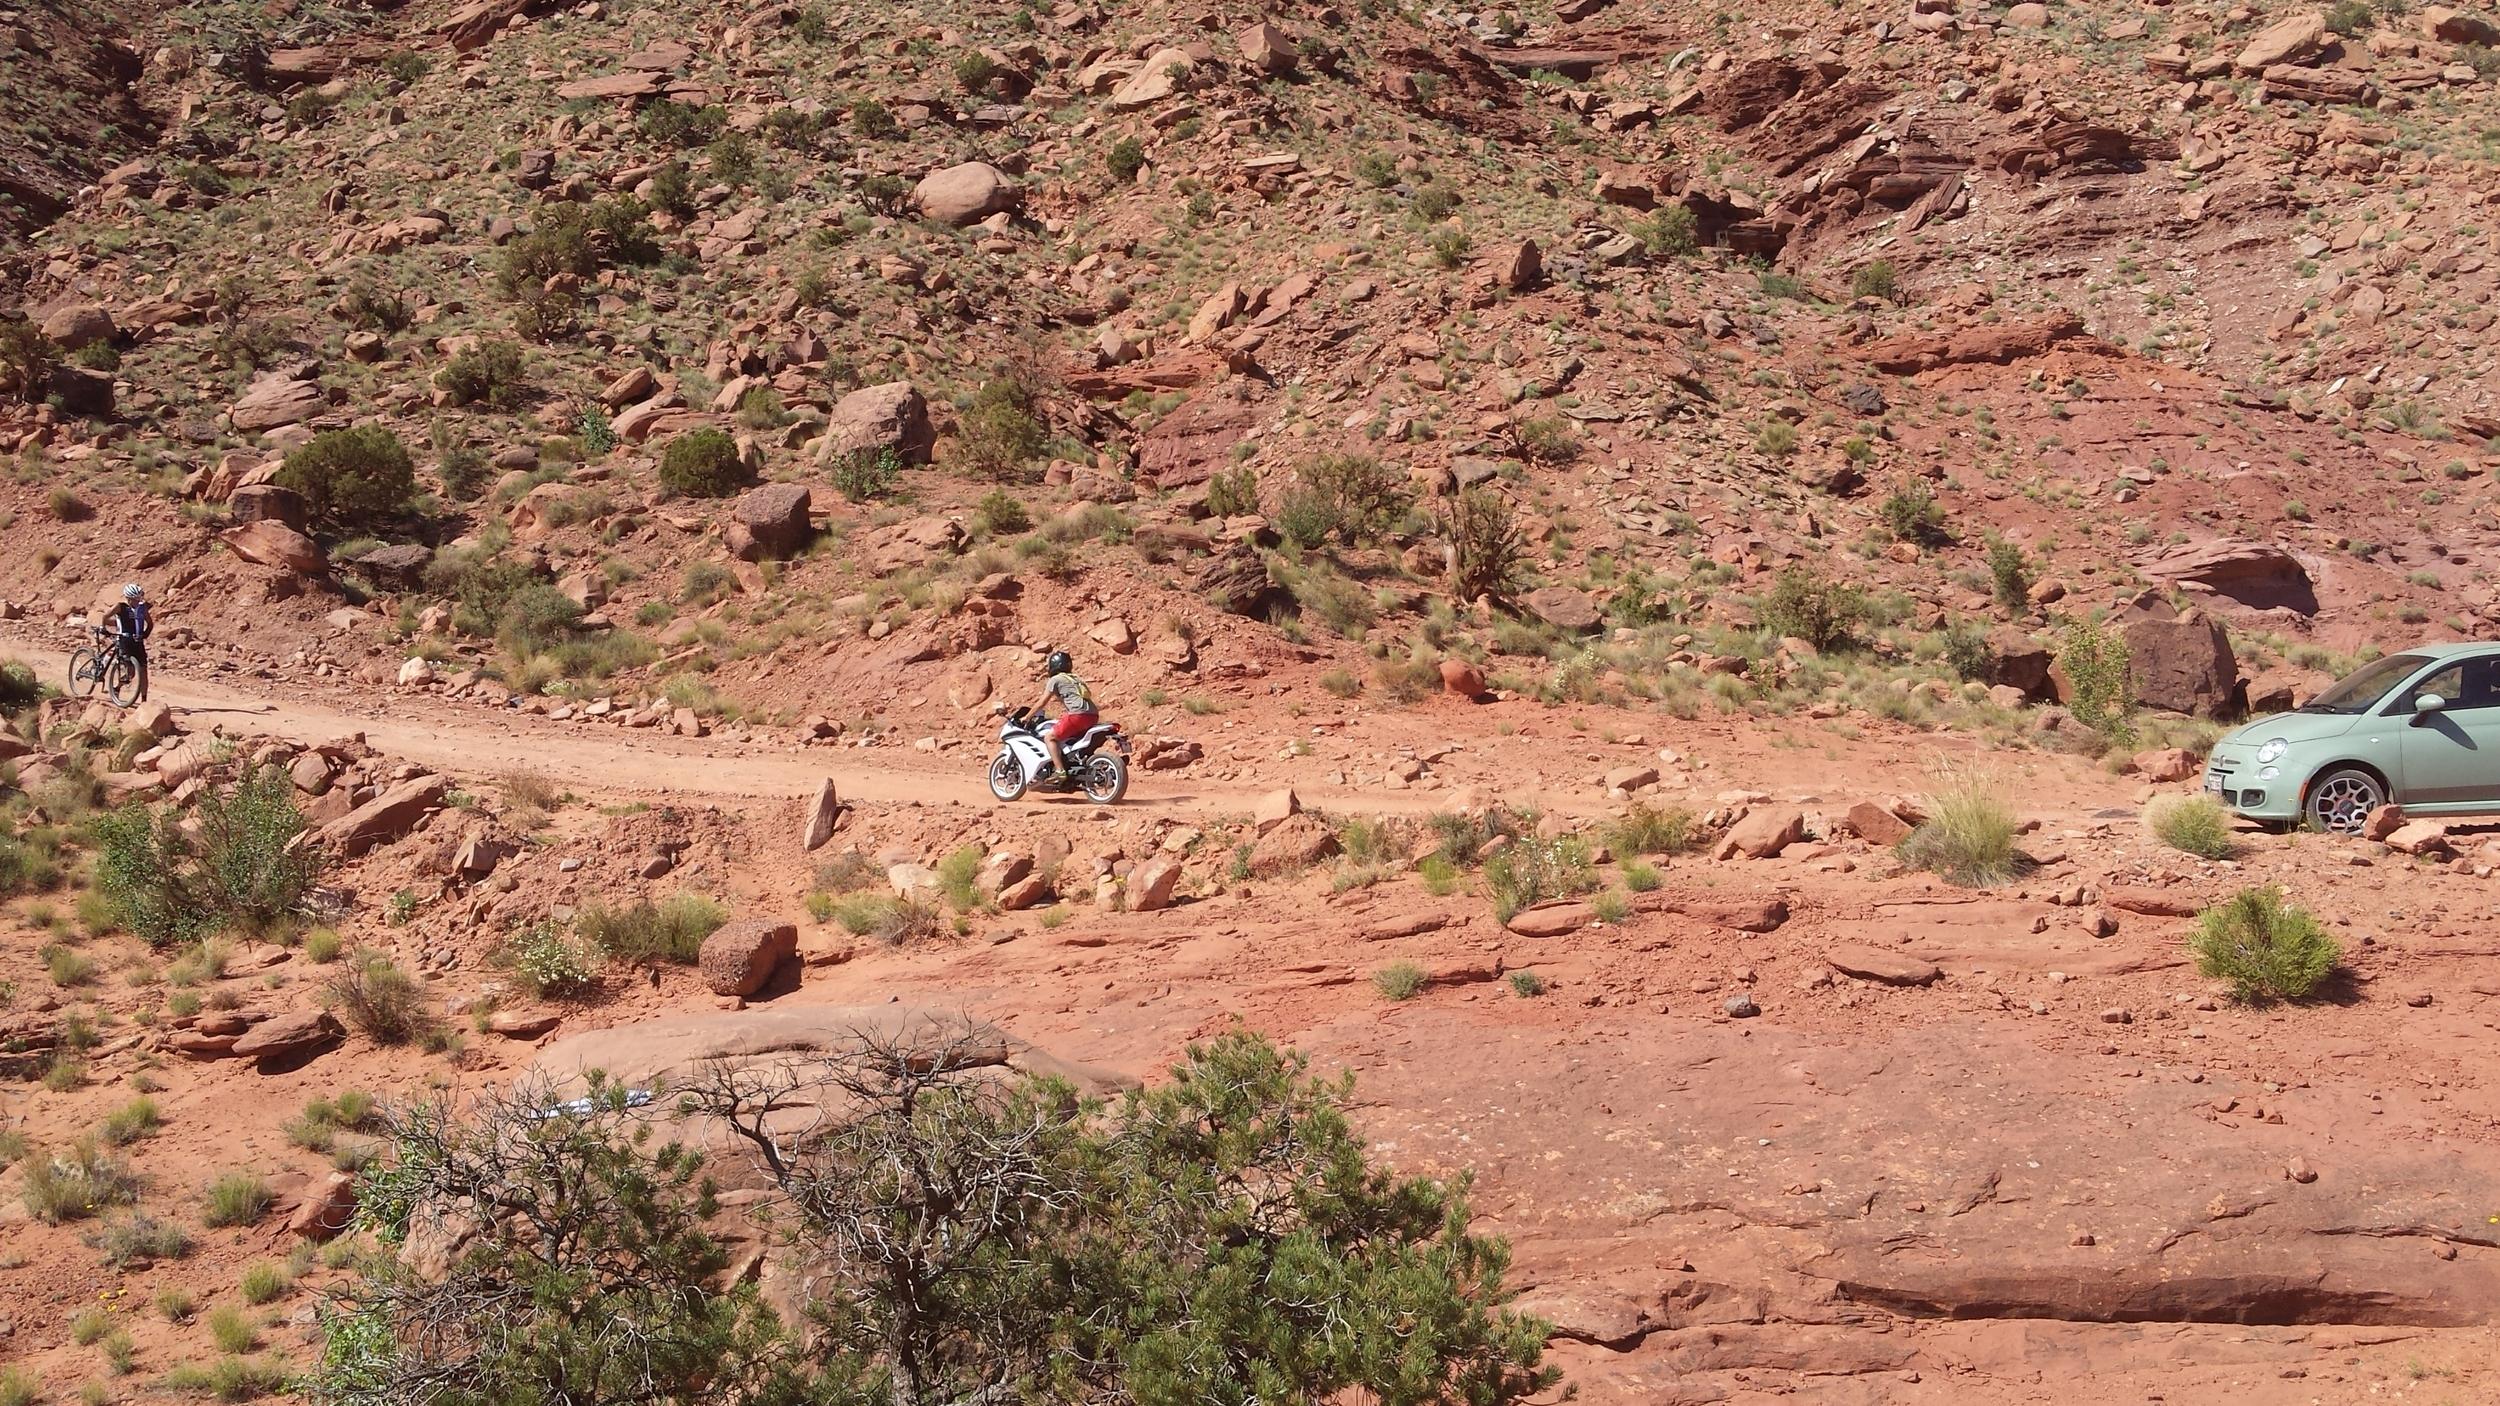 Benjamin off-roading on his baby street bike.